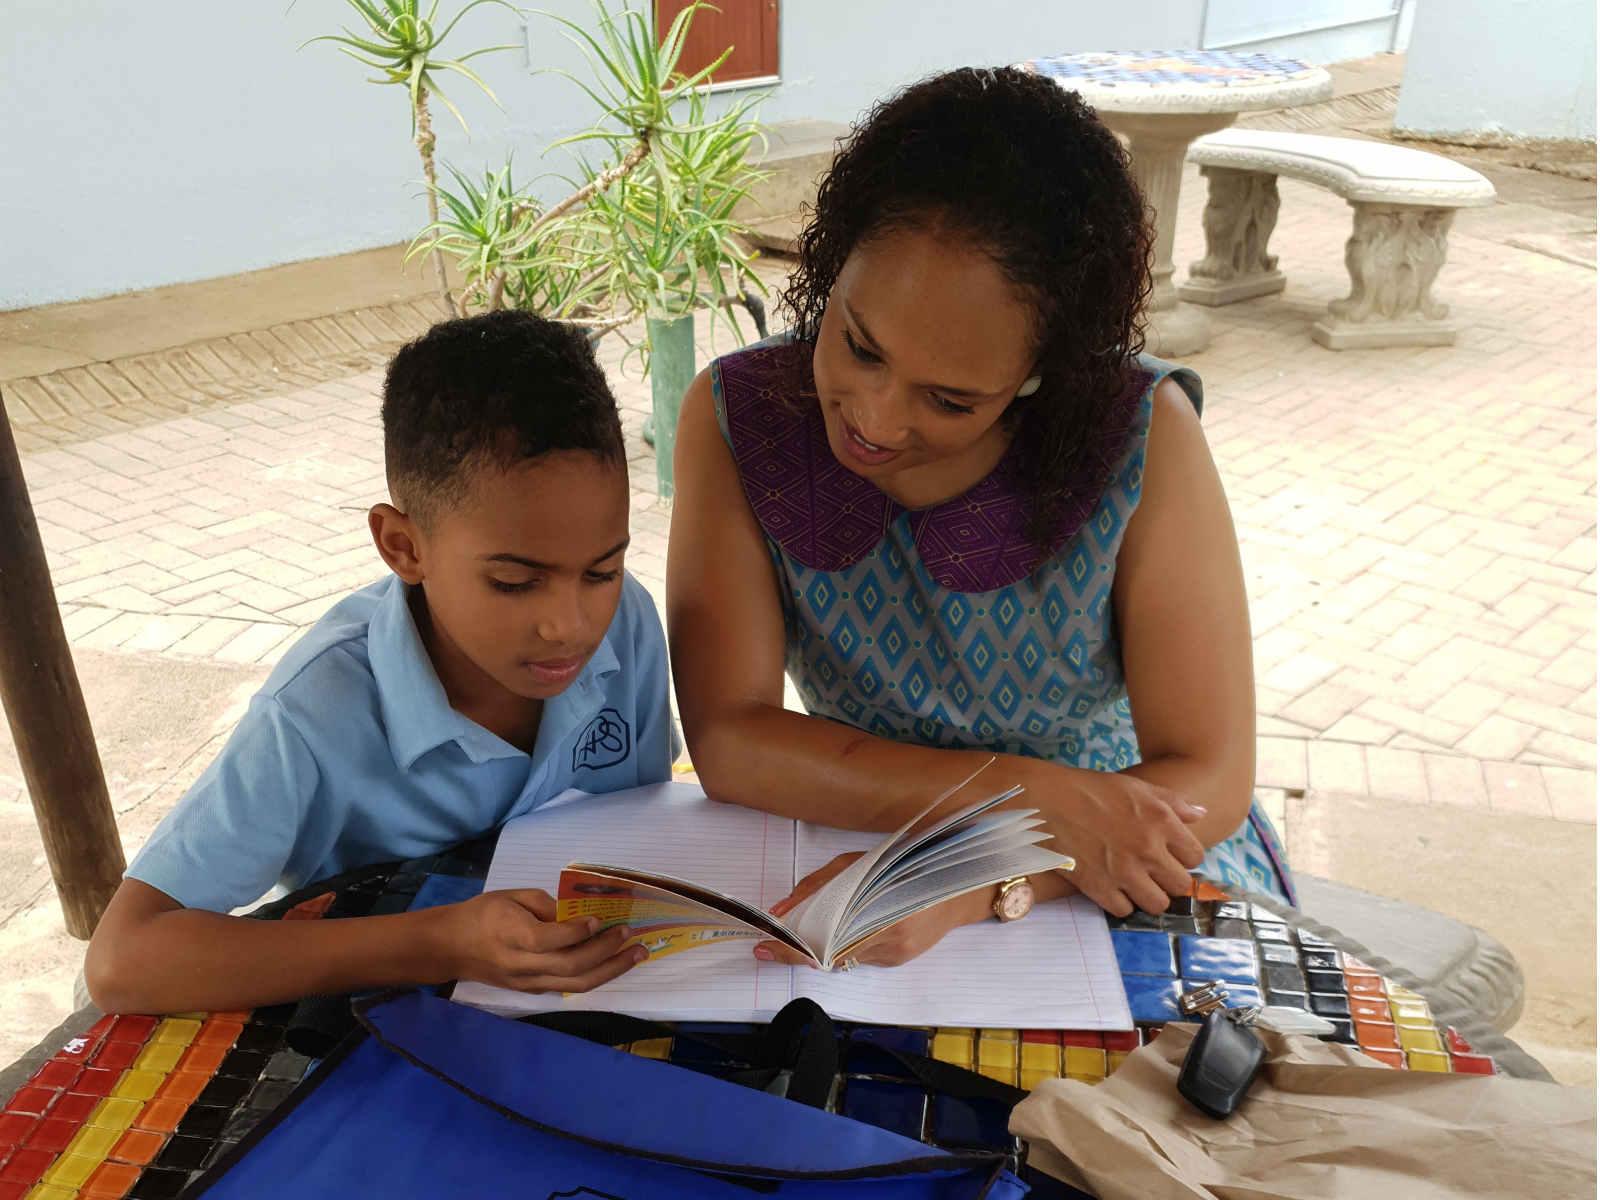 A teacher's perspective on homework in Botswana